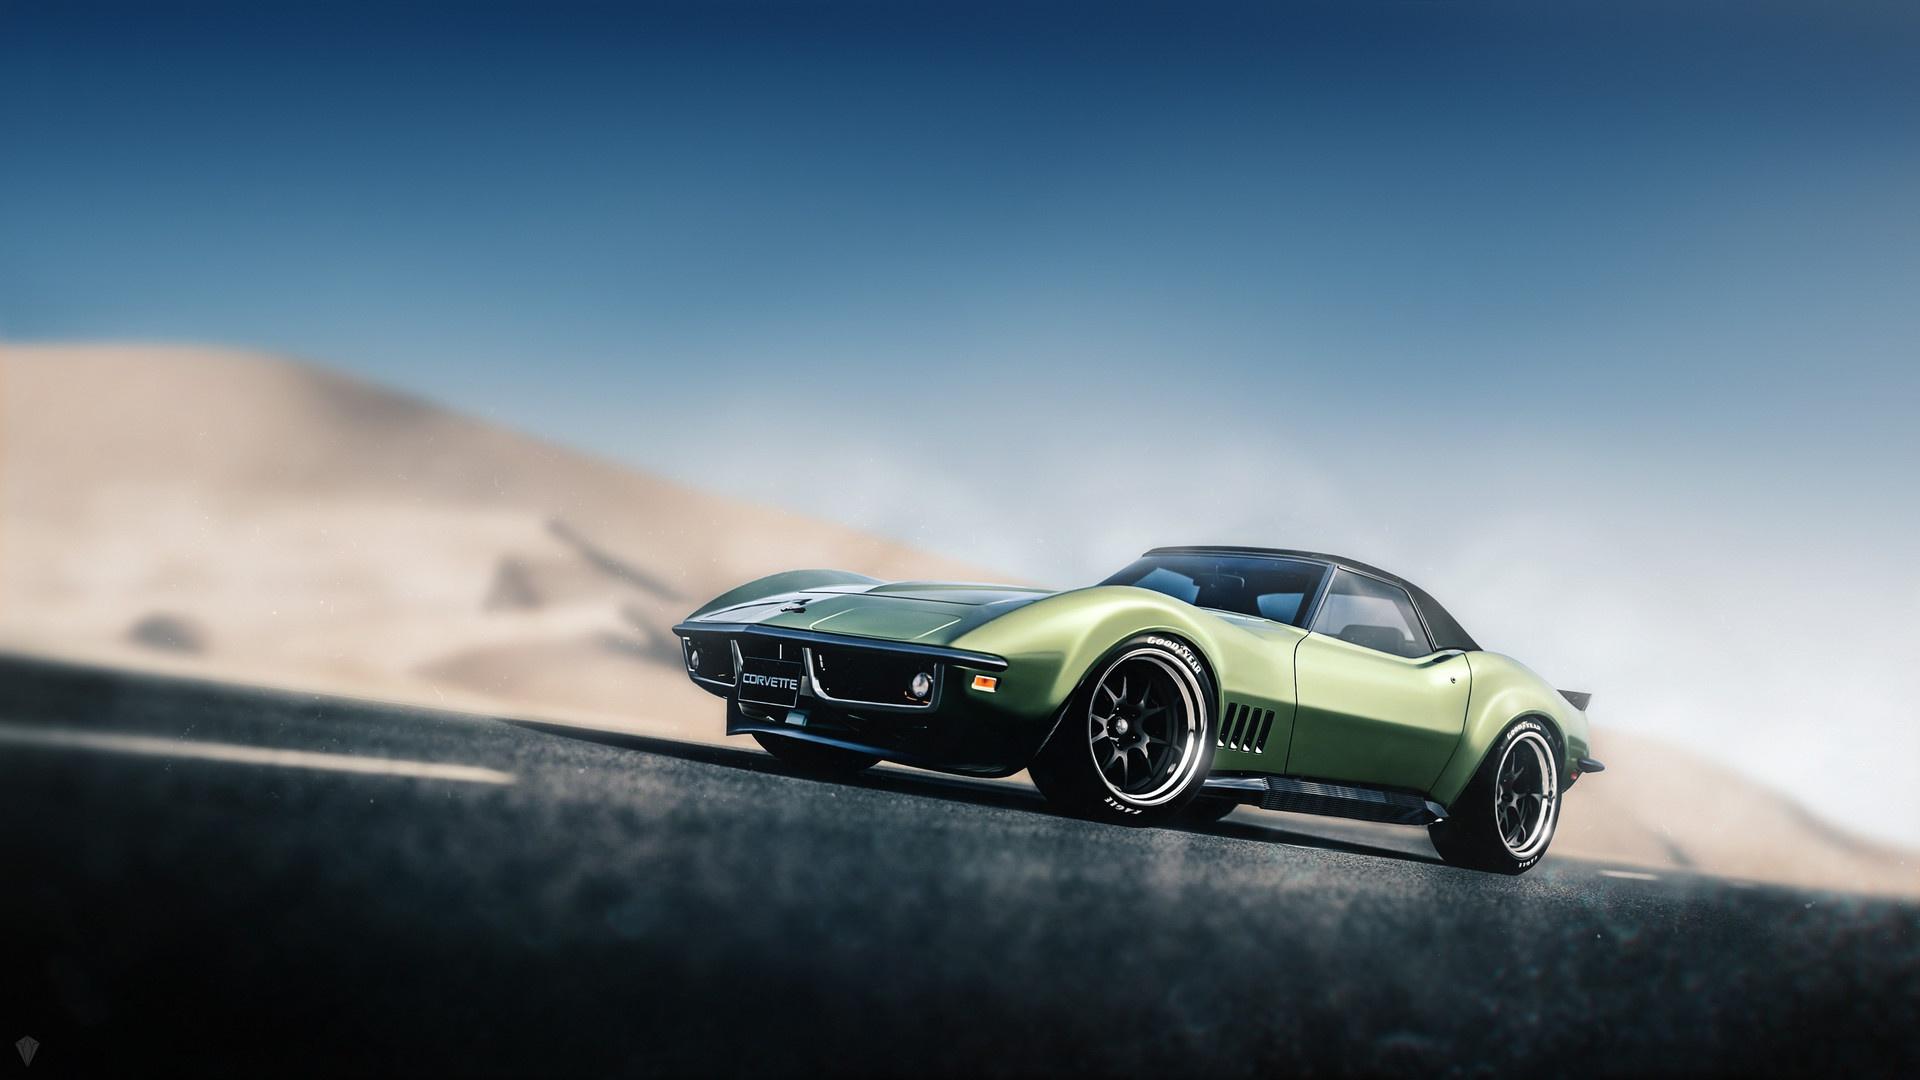 Wallpaper Car Vehicle Corvette Artwork Green Cars